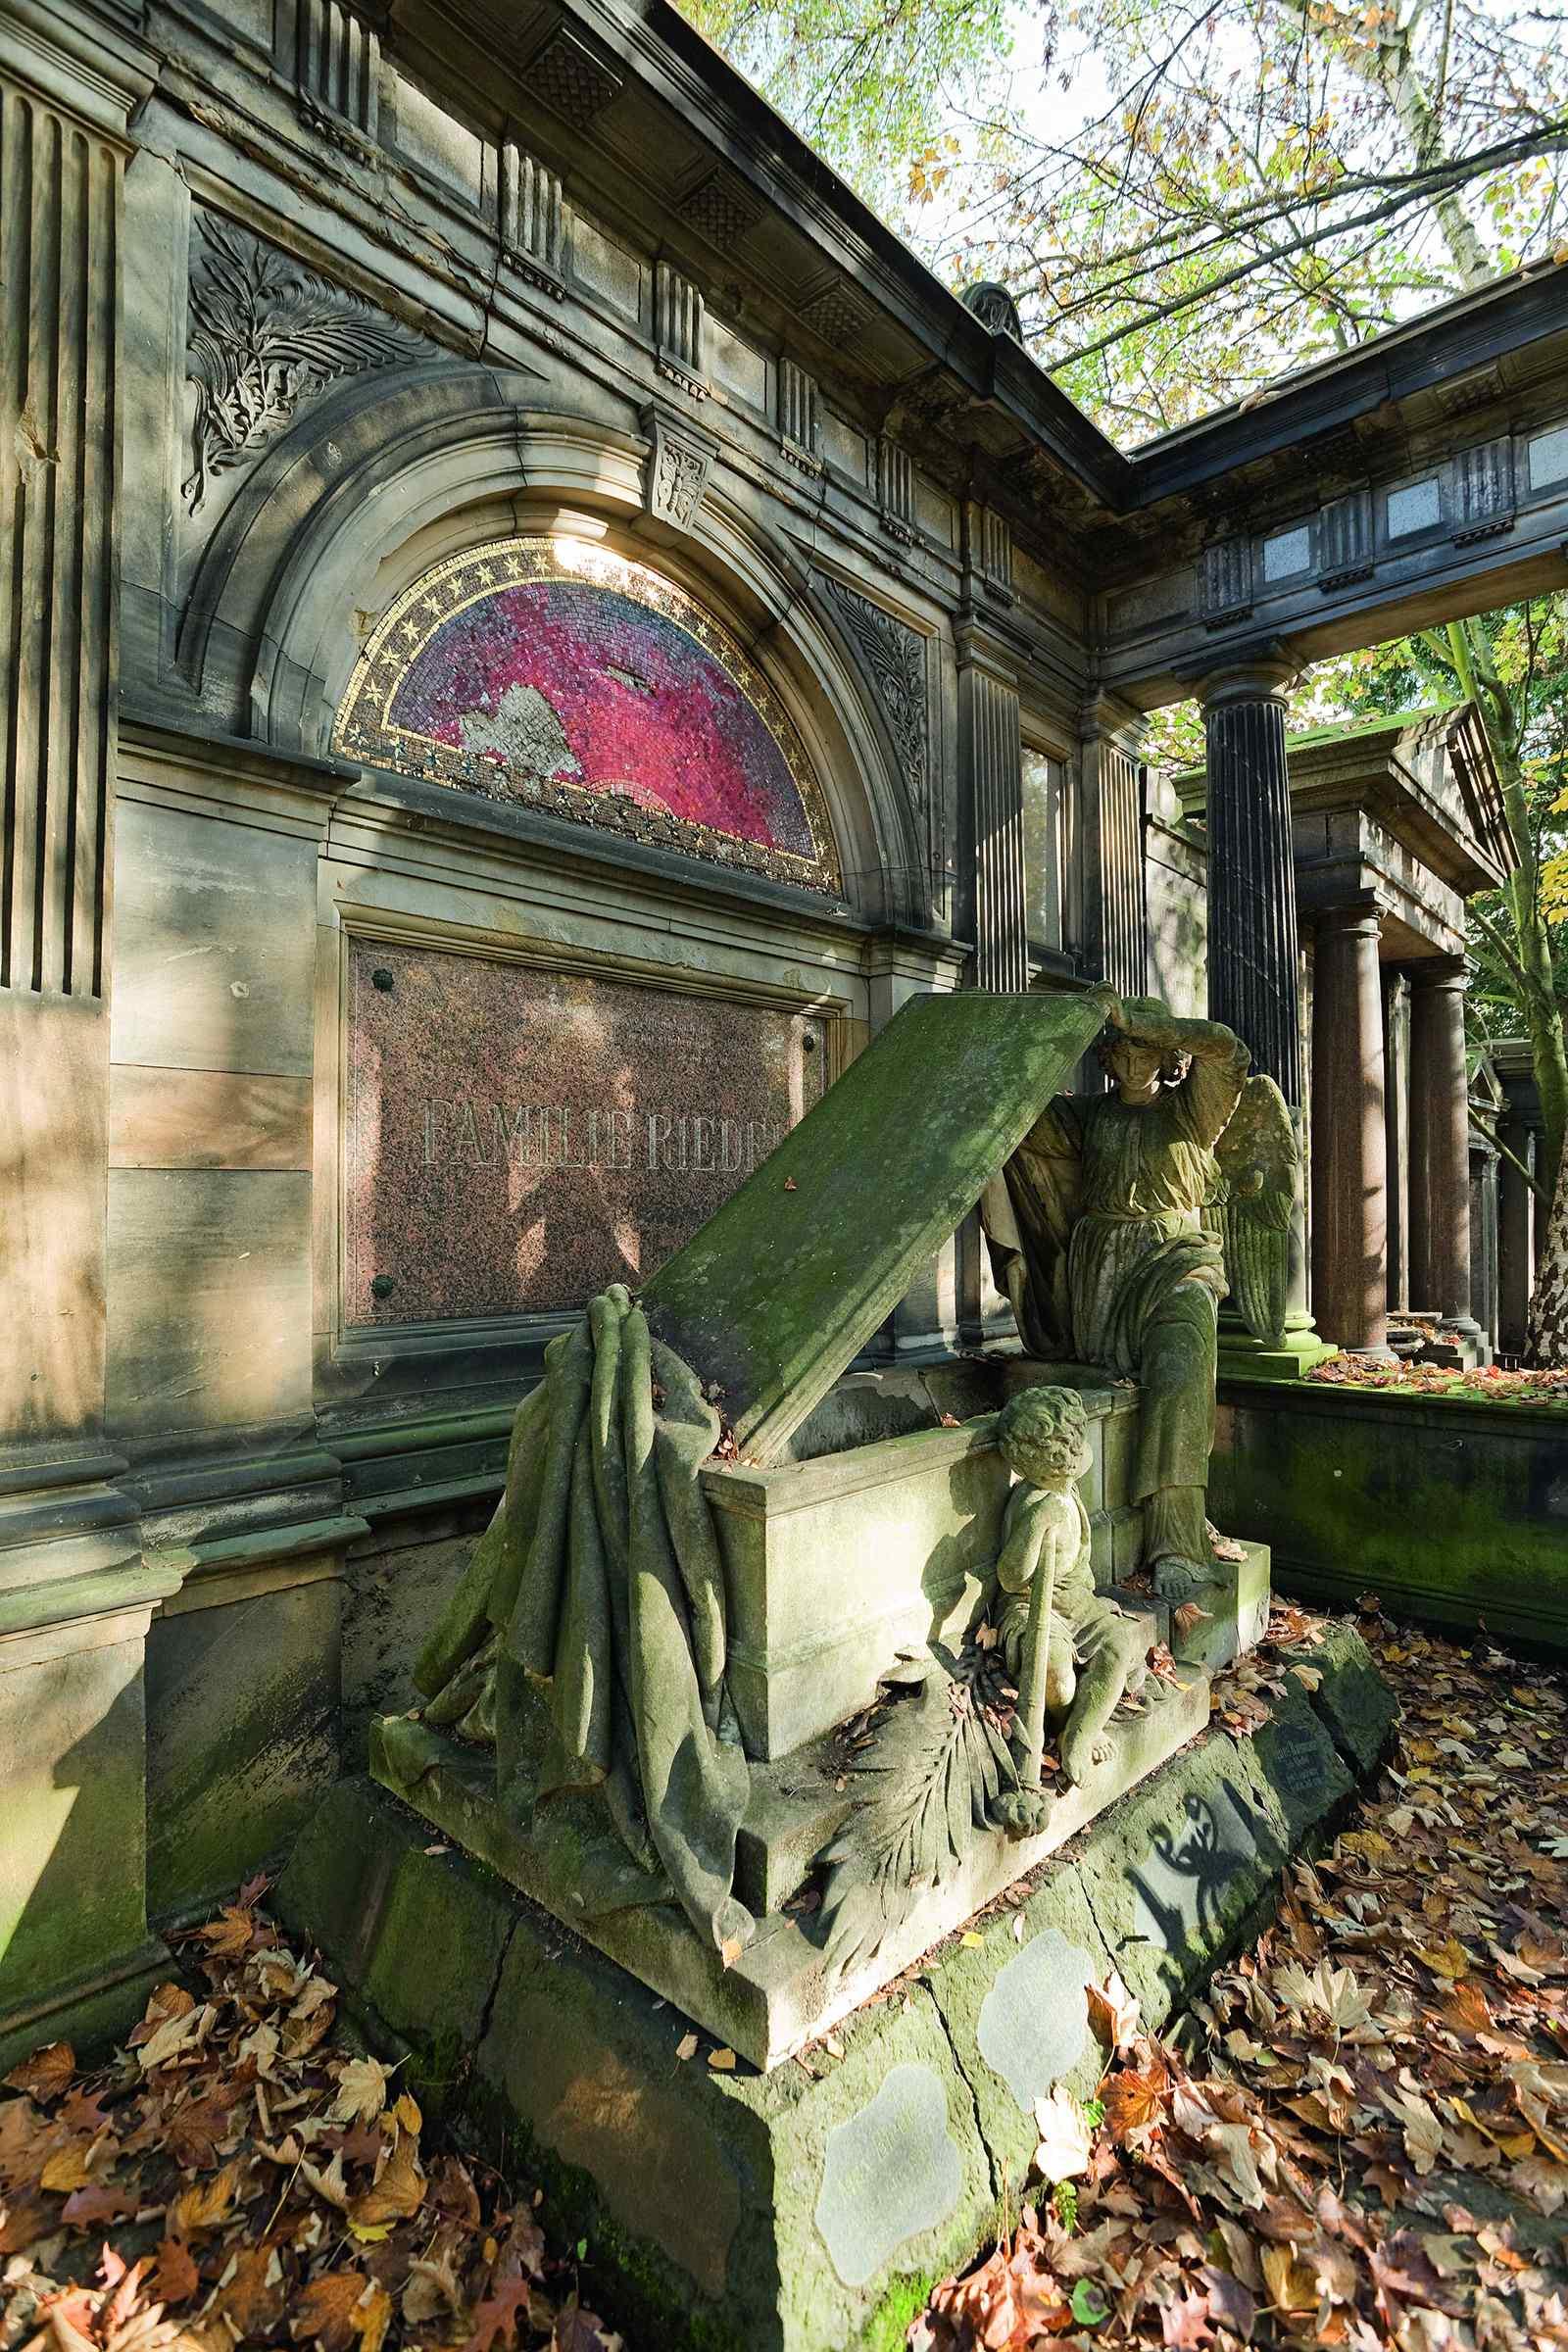 Grabstätte der Familie Riedel; Foto: Daniela Friebel